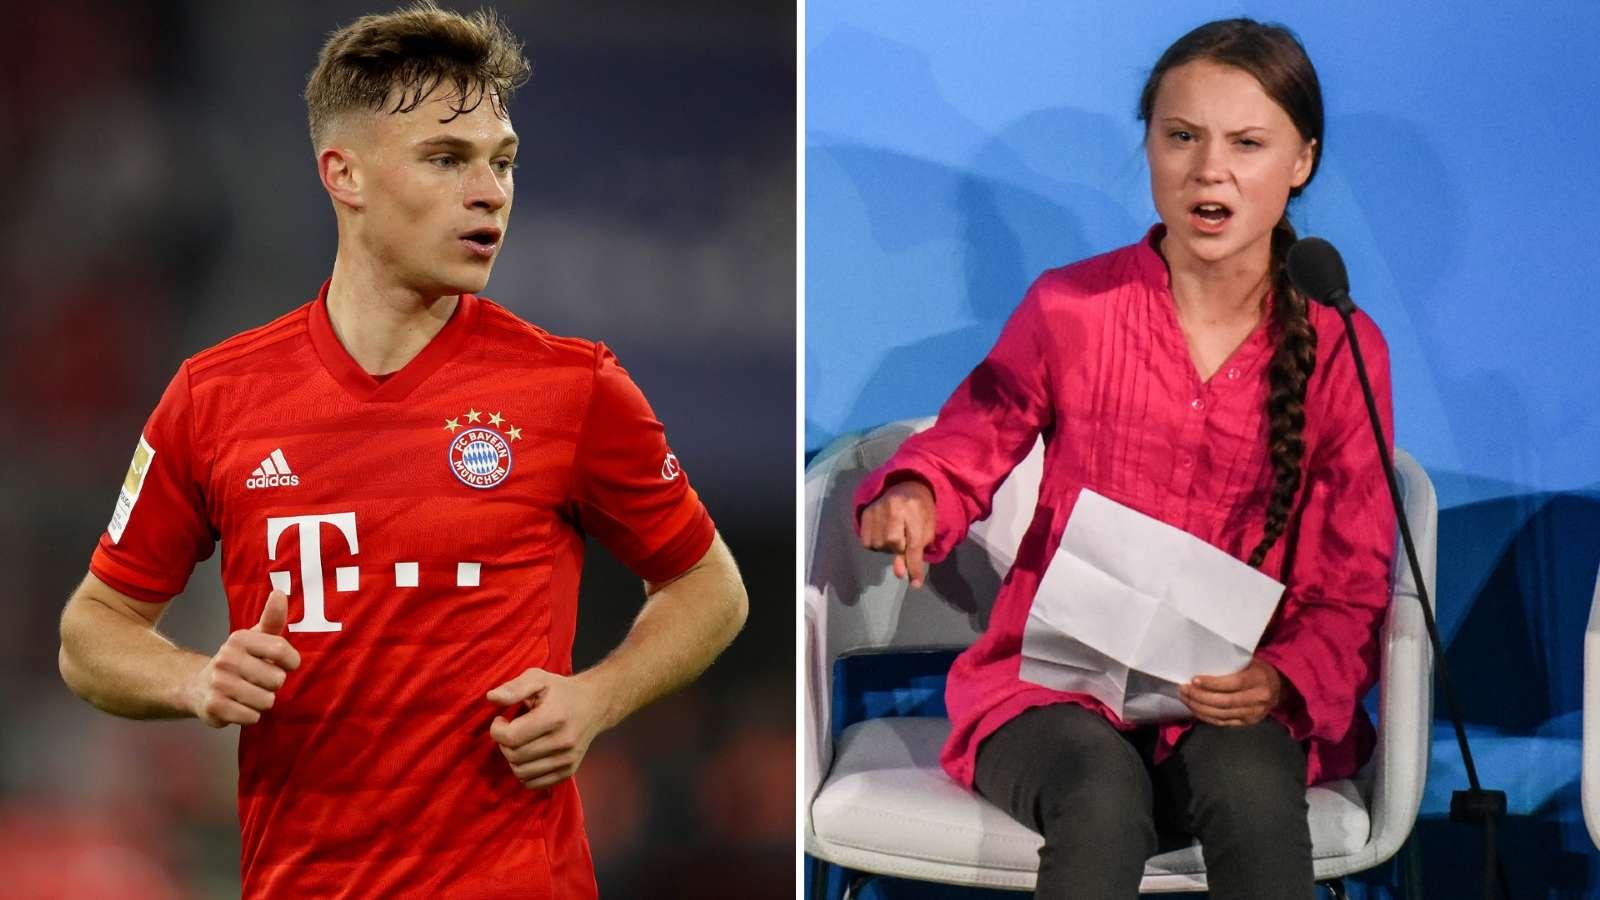 آلمان-بوندسلیگا-بایرن مونیخ-باوارایایی ها-Bayern Munich-Germnay